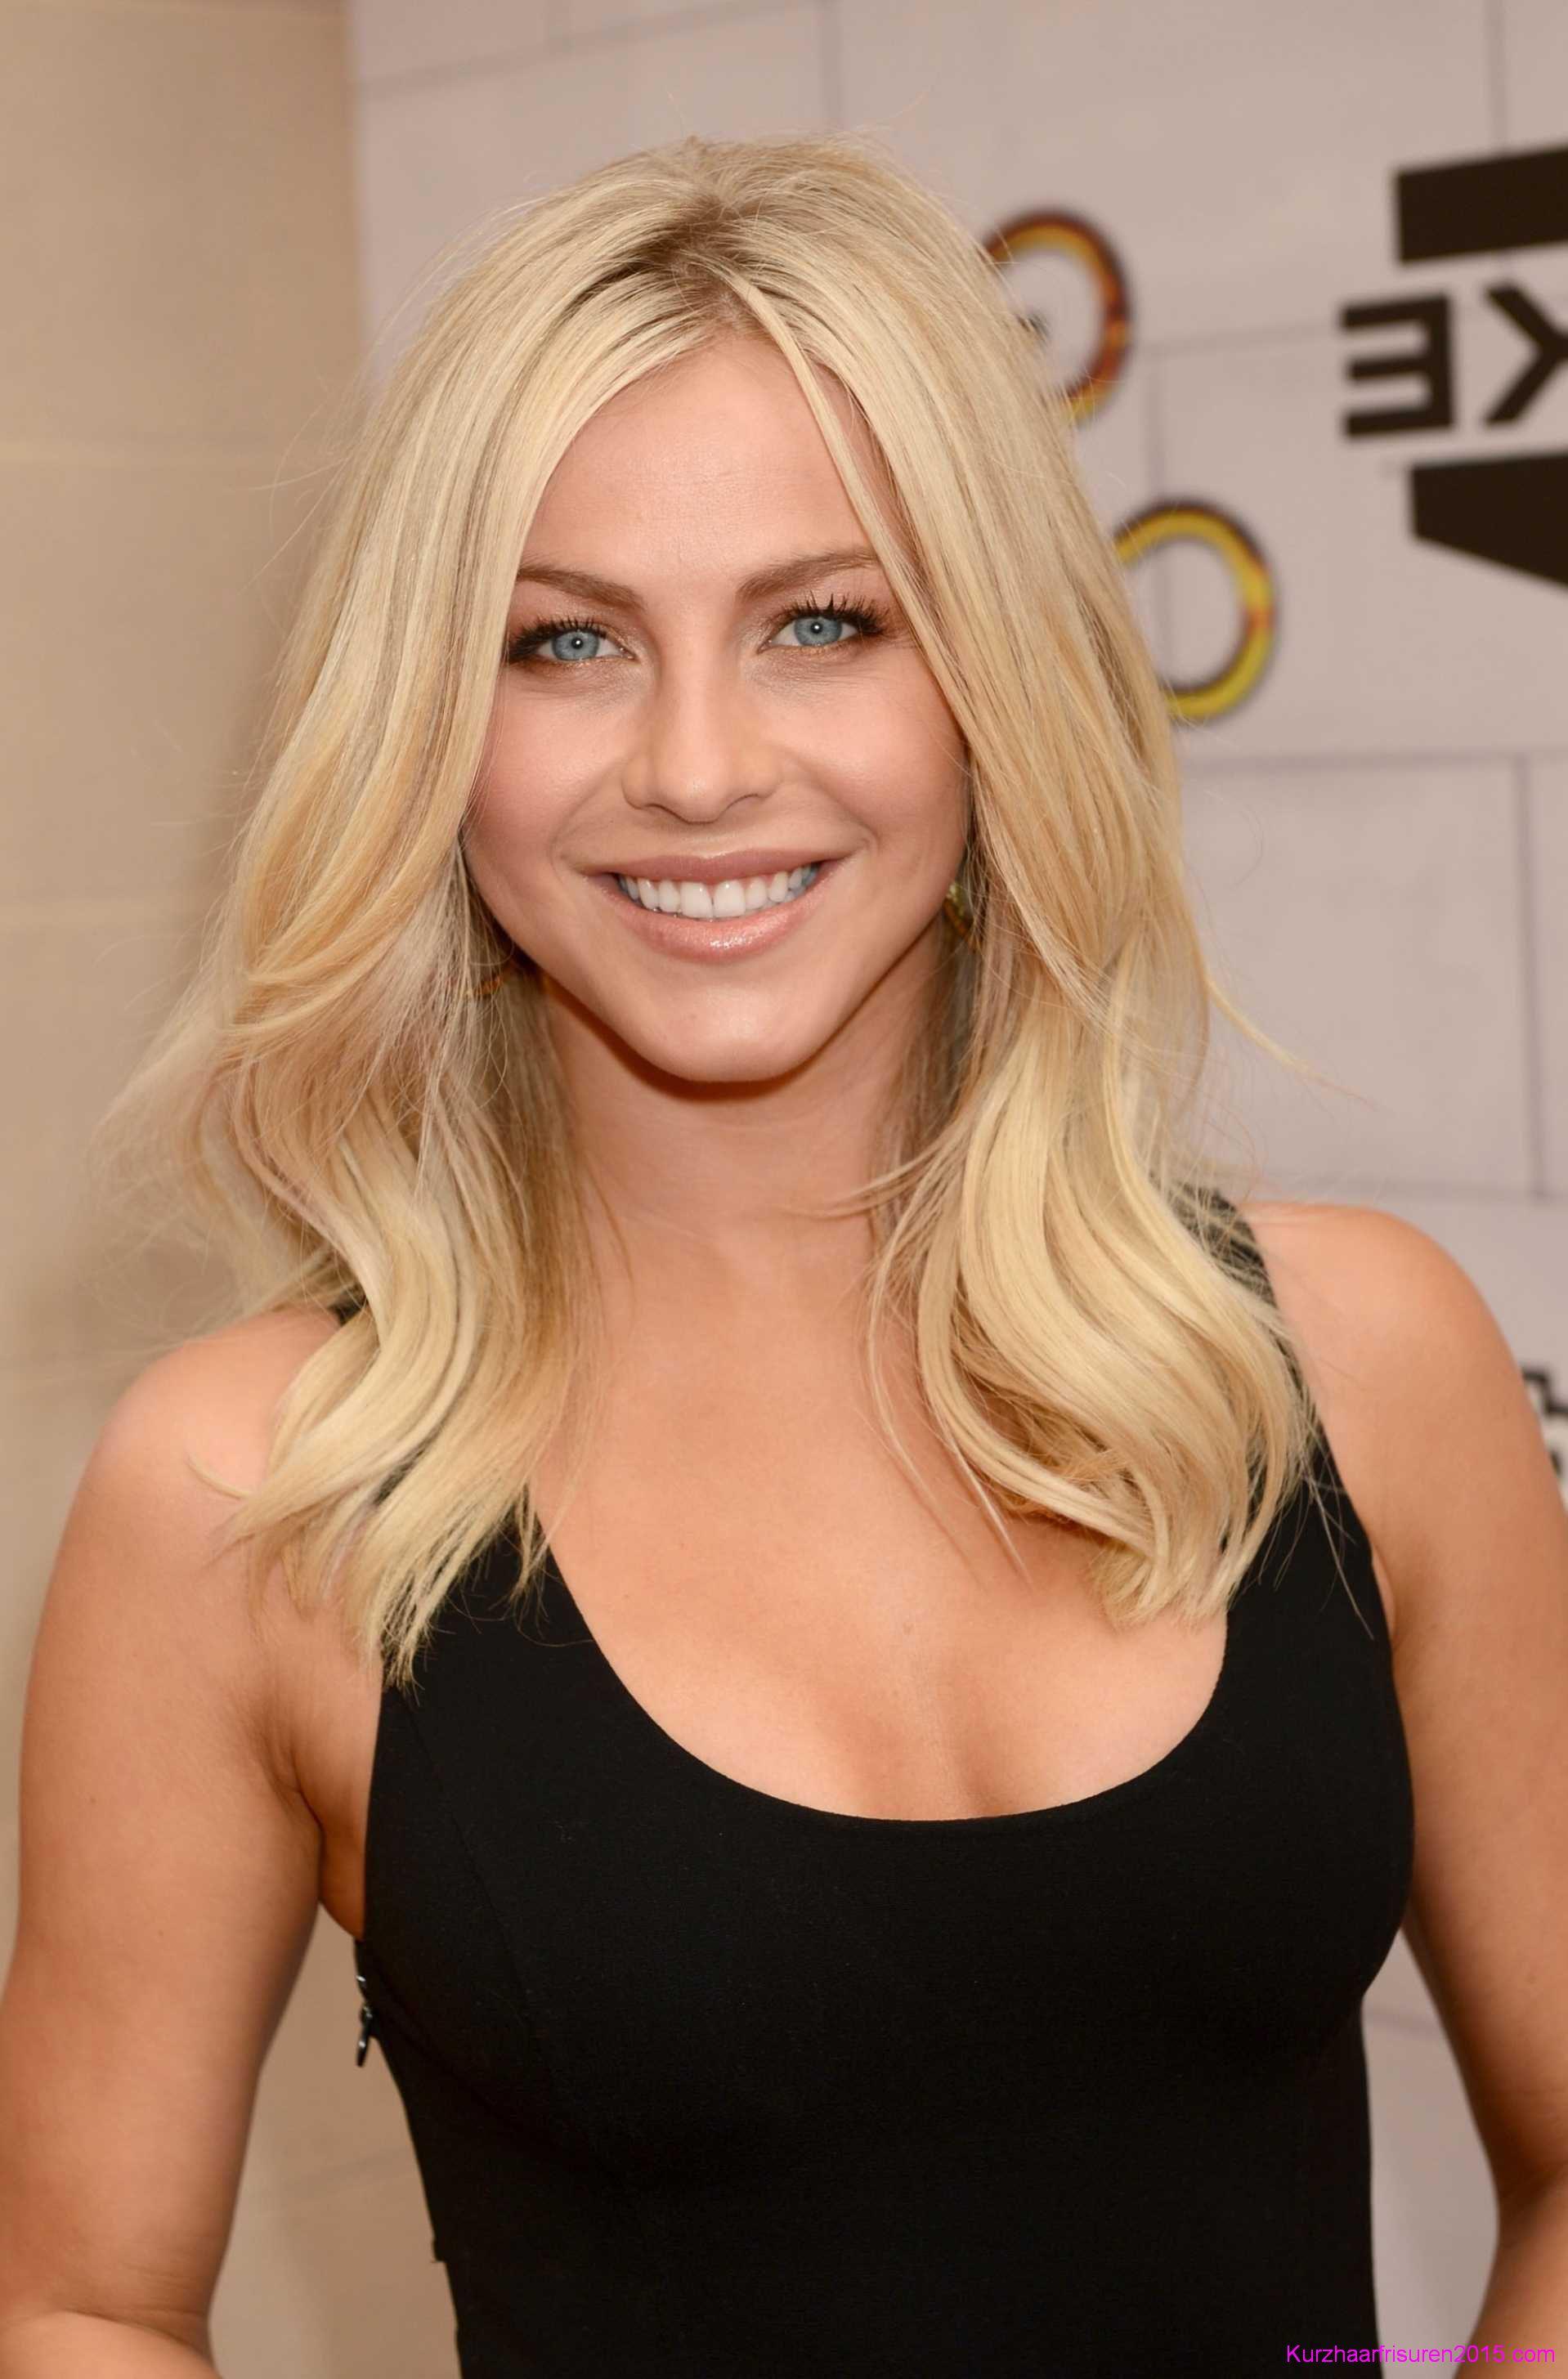 kurzhaarfrisuren blond frisuren ideen